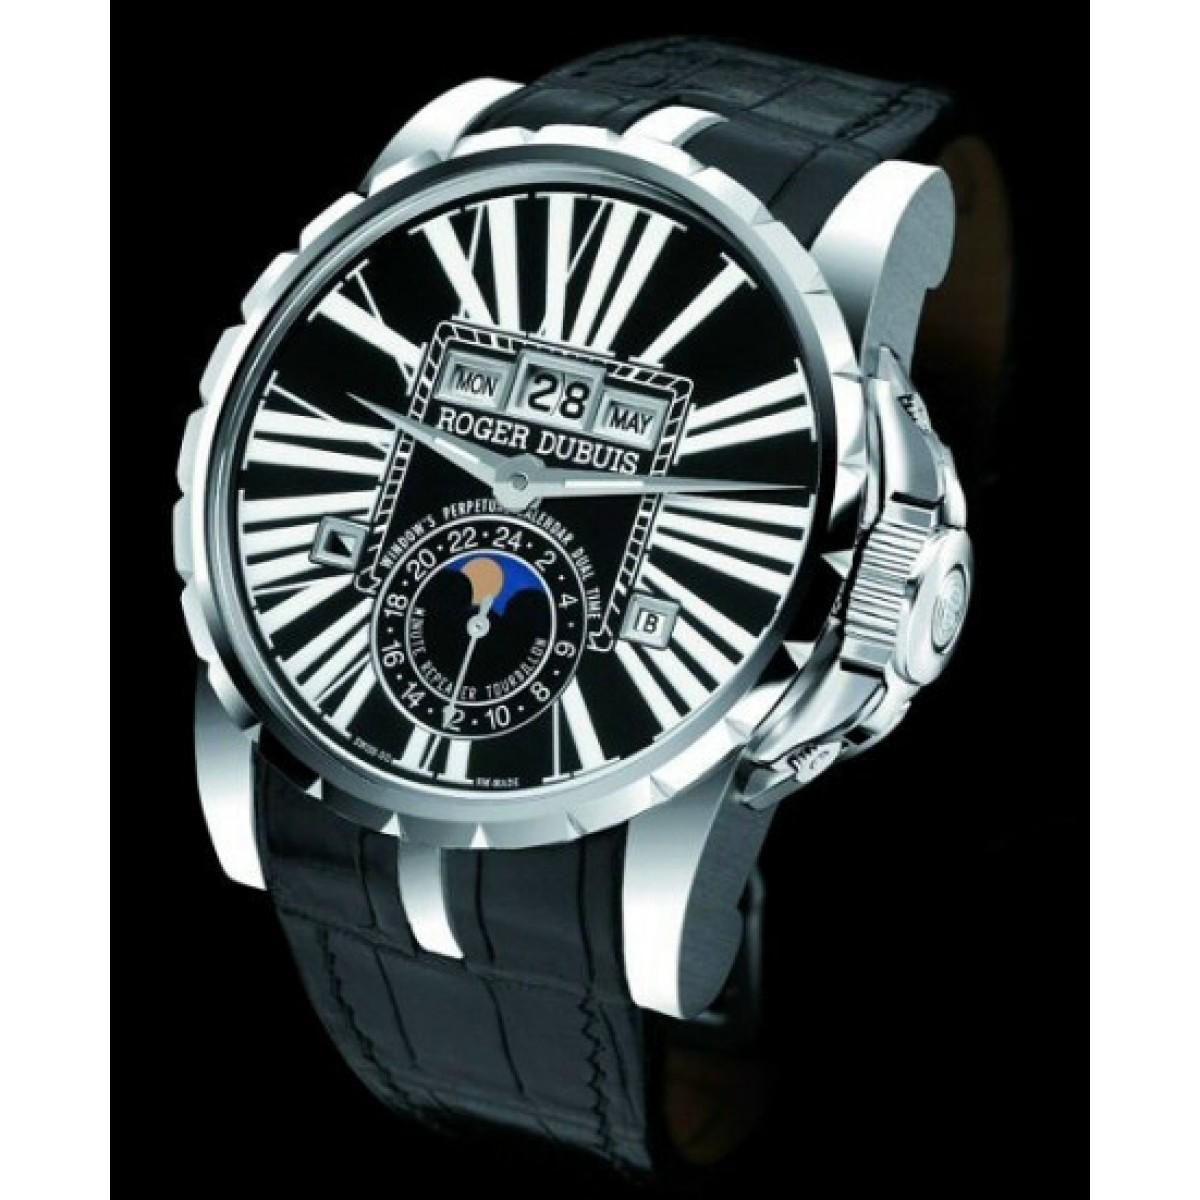 9c4b8eae982 Espiar · Relógio Réplica Roger Dubuis Excalibur Minute